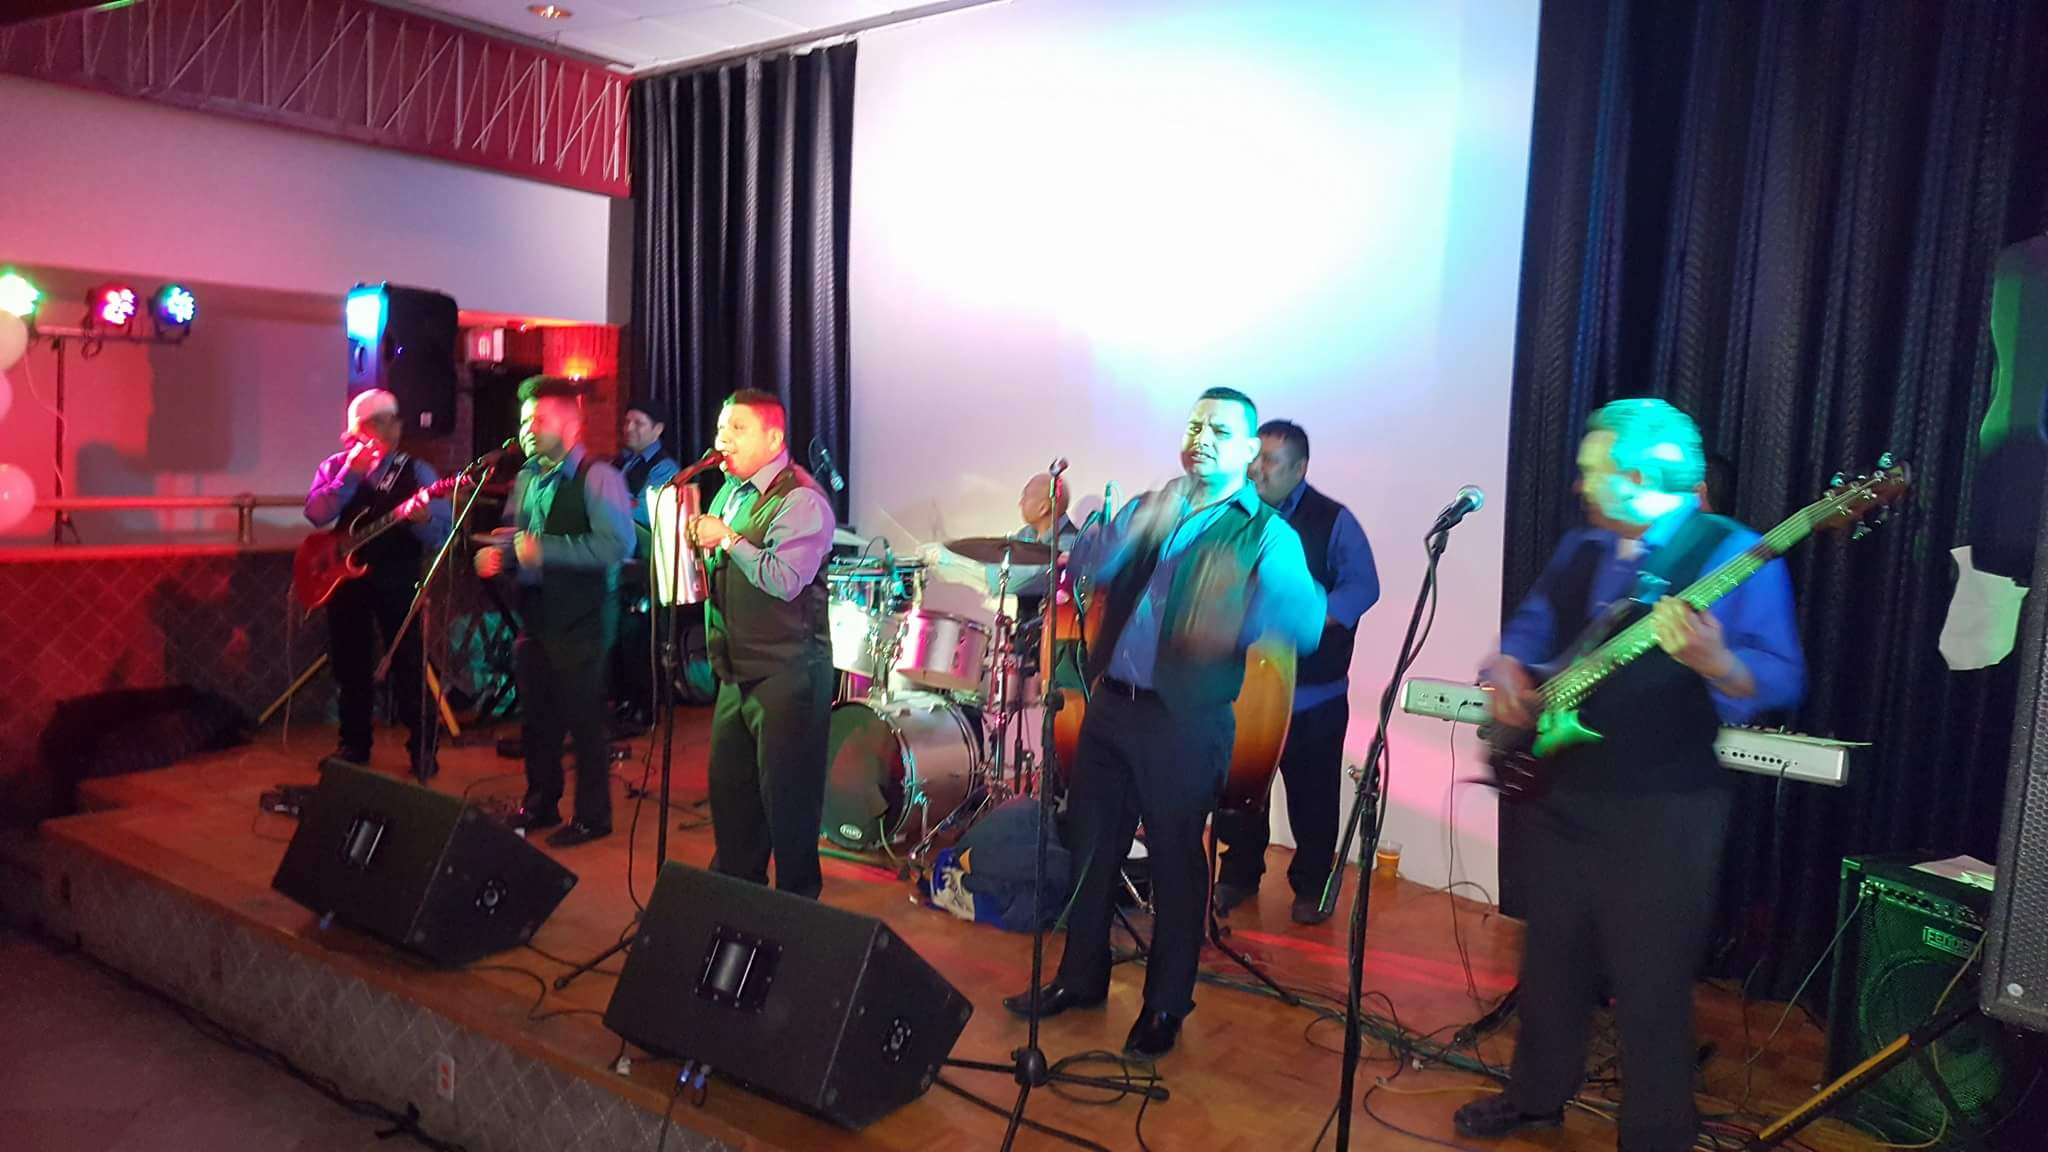 2. Grupo Los Nitidos (Evento 4-8-17)